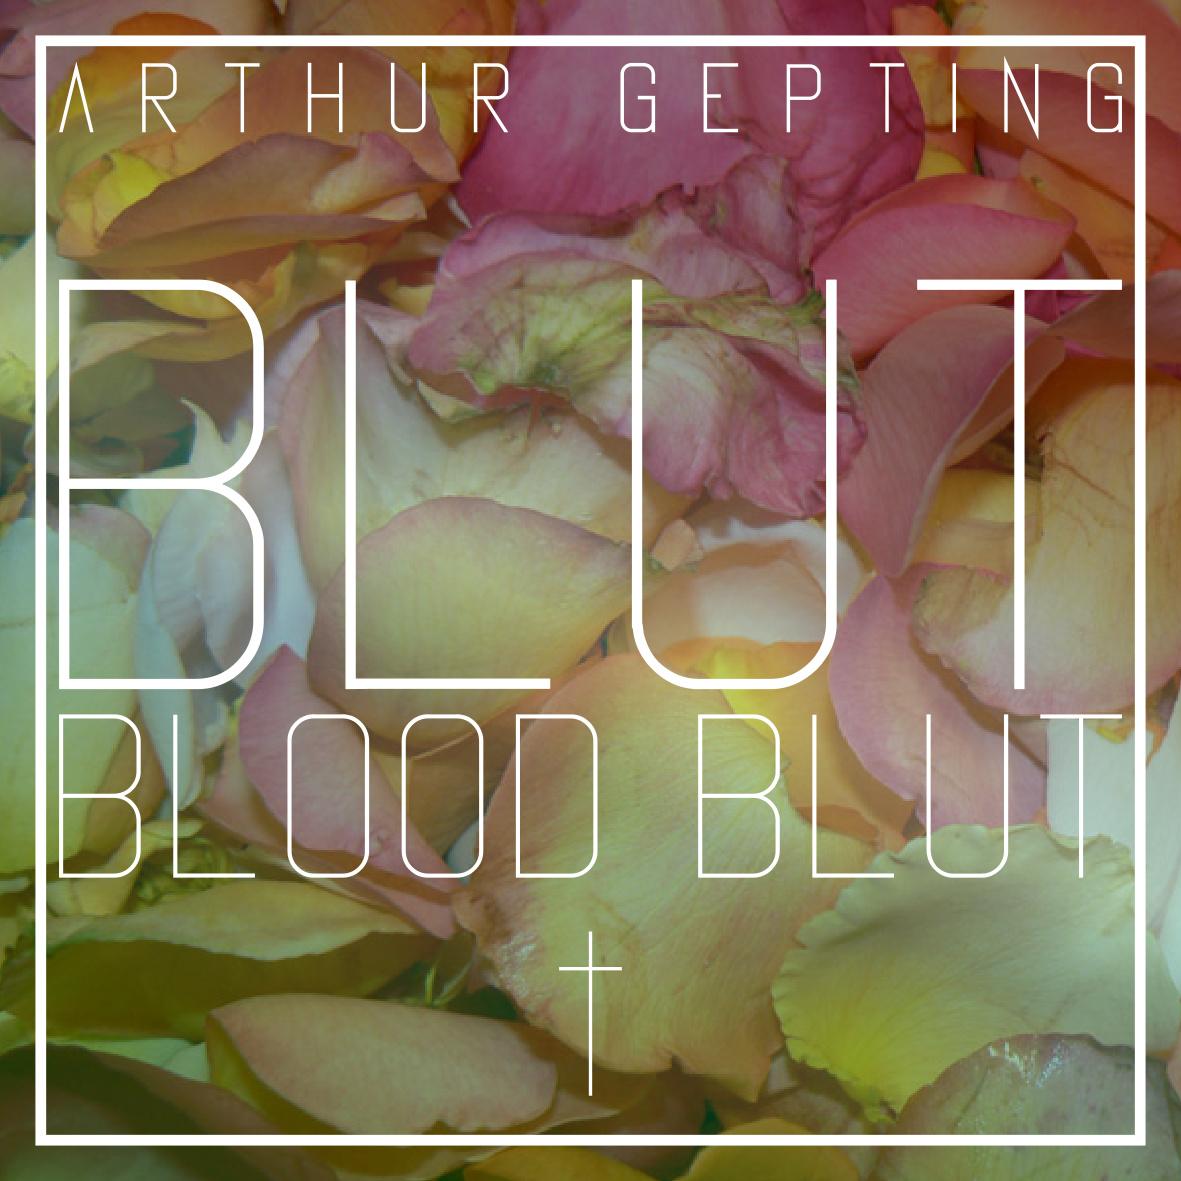 Arthur Gepting-Blut Blood Blut.jpg